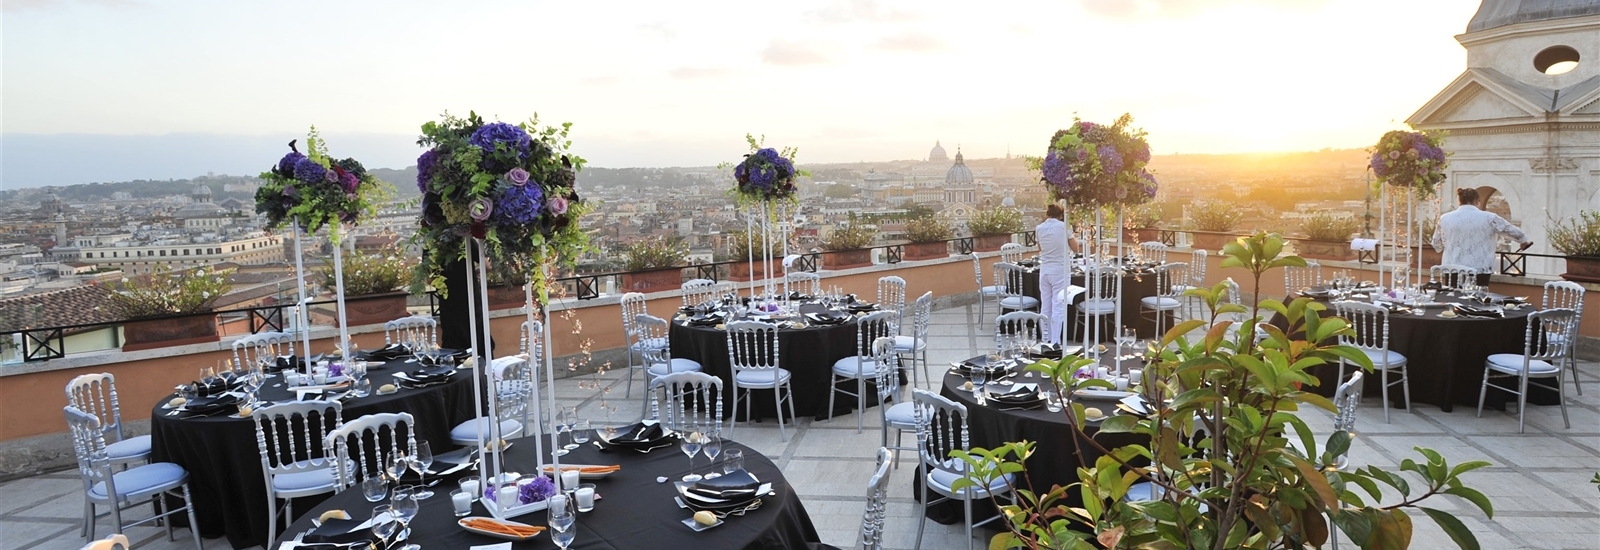 Pacchetti Matrimonio Roma | Hassler Roma